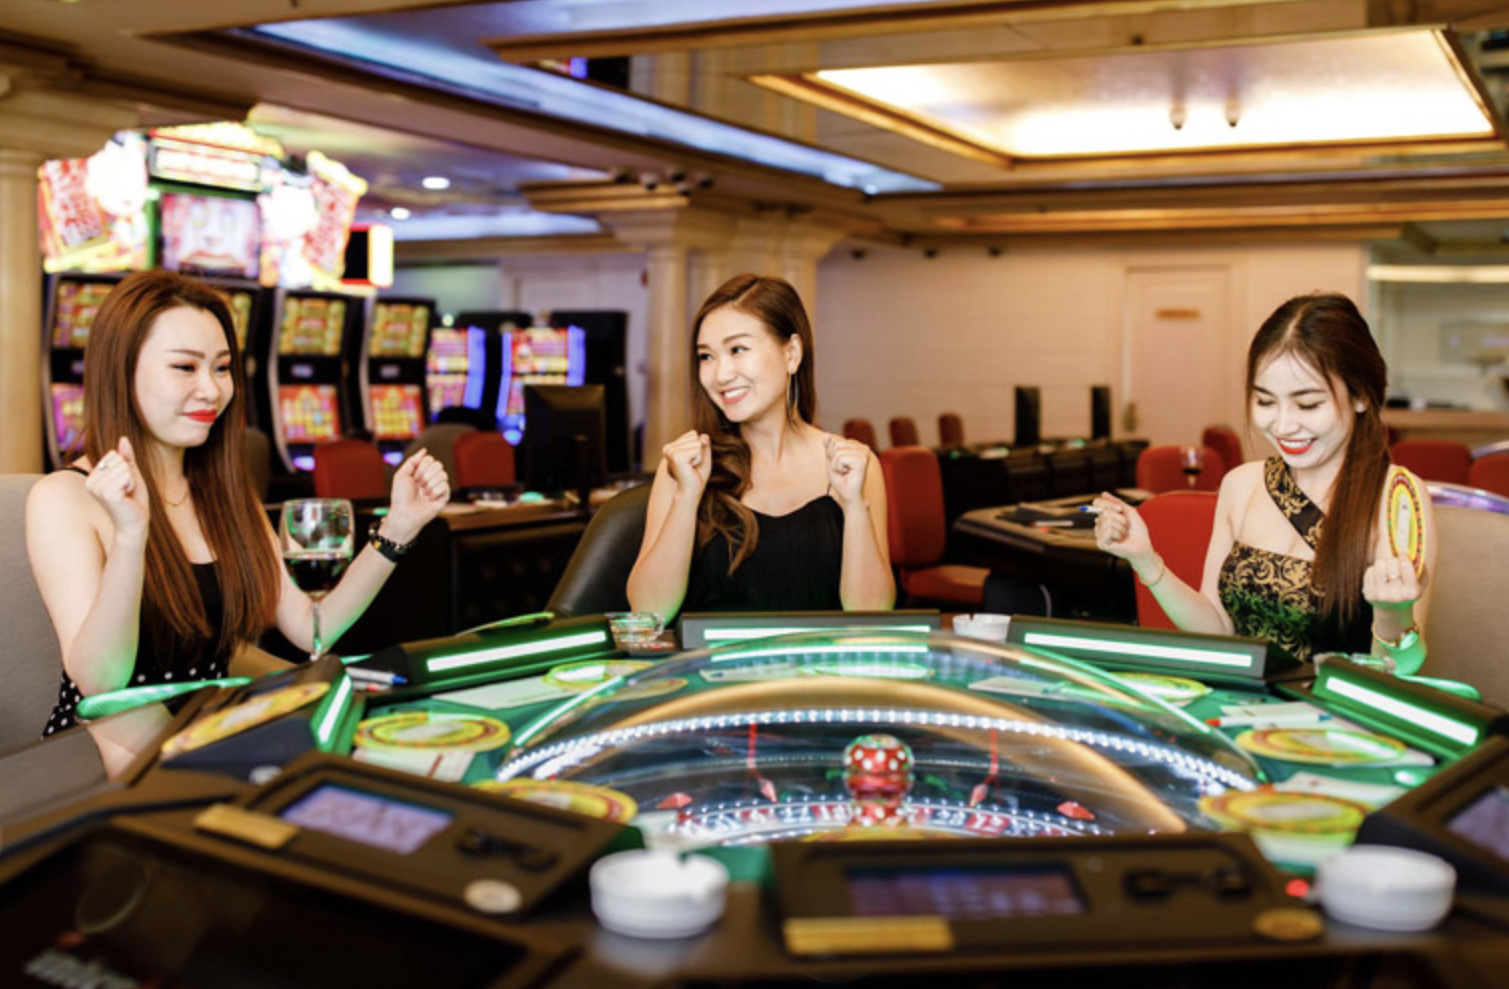 Short on cash, Vietnam punts on gambling - Asia Times